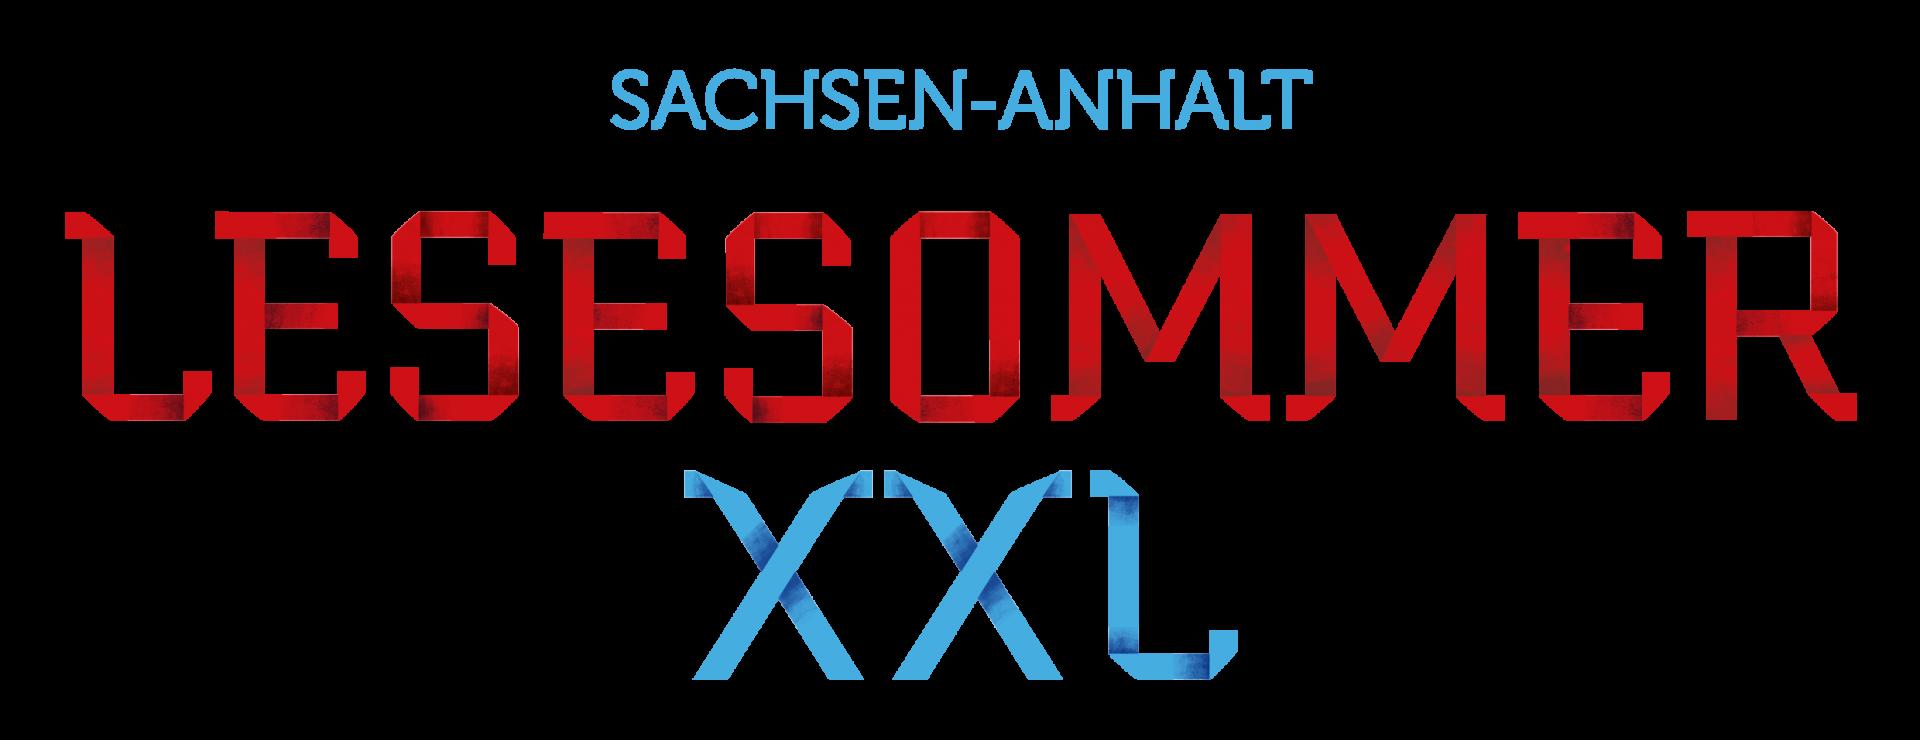 LesesommerXXL